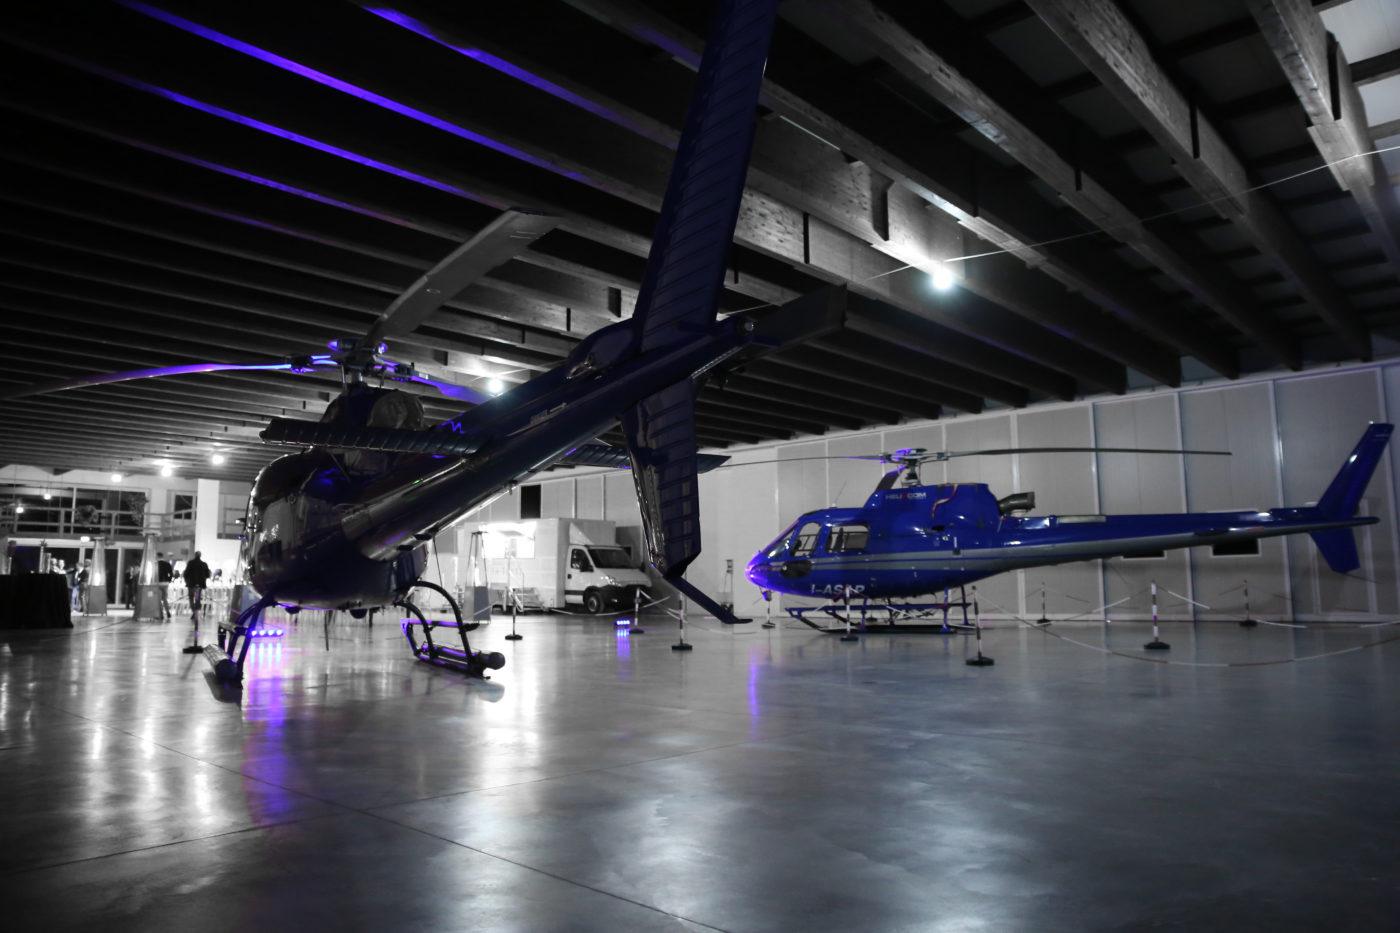 elicottero trasporto merci prezzo